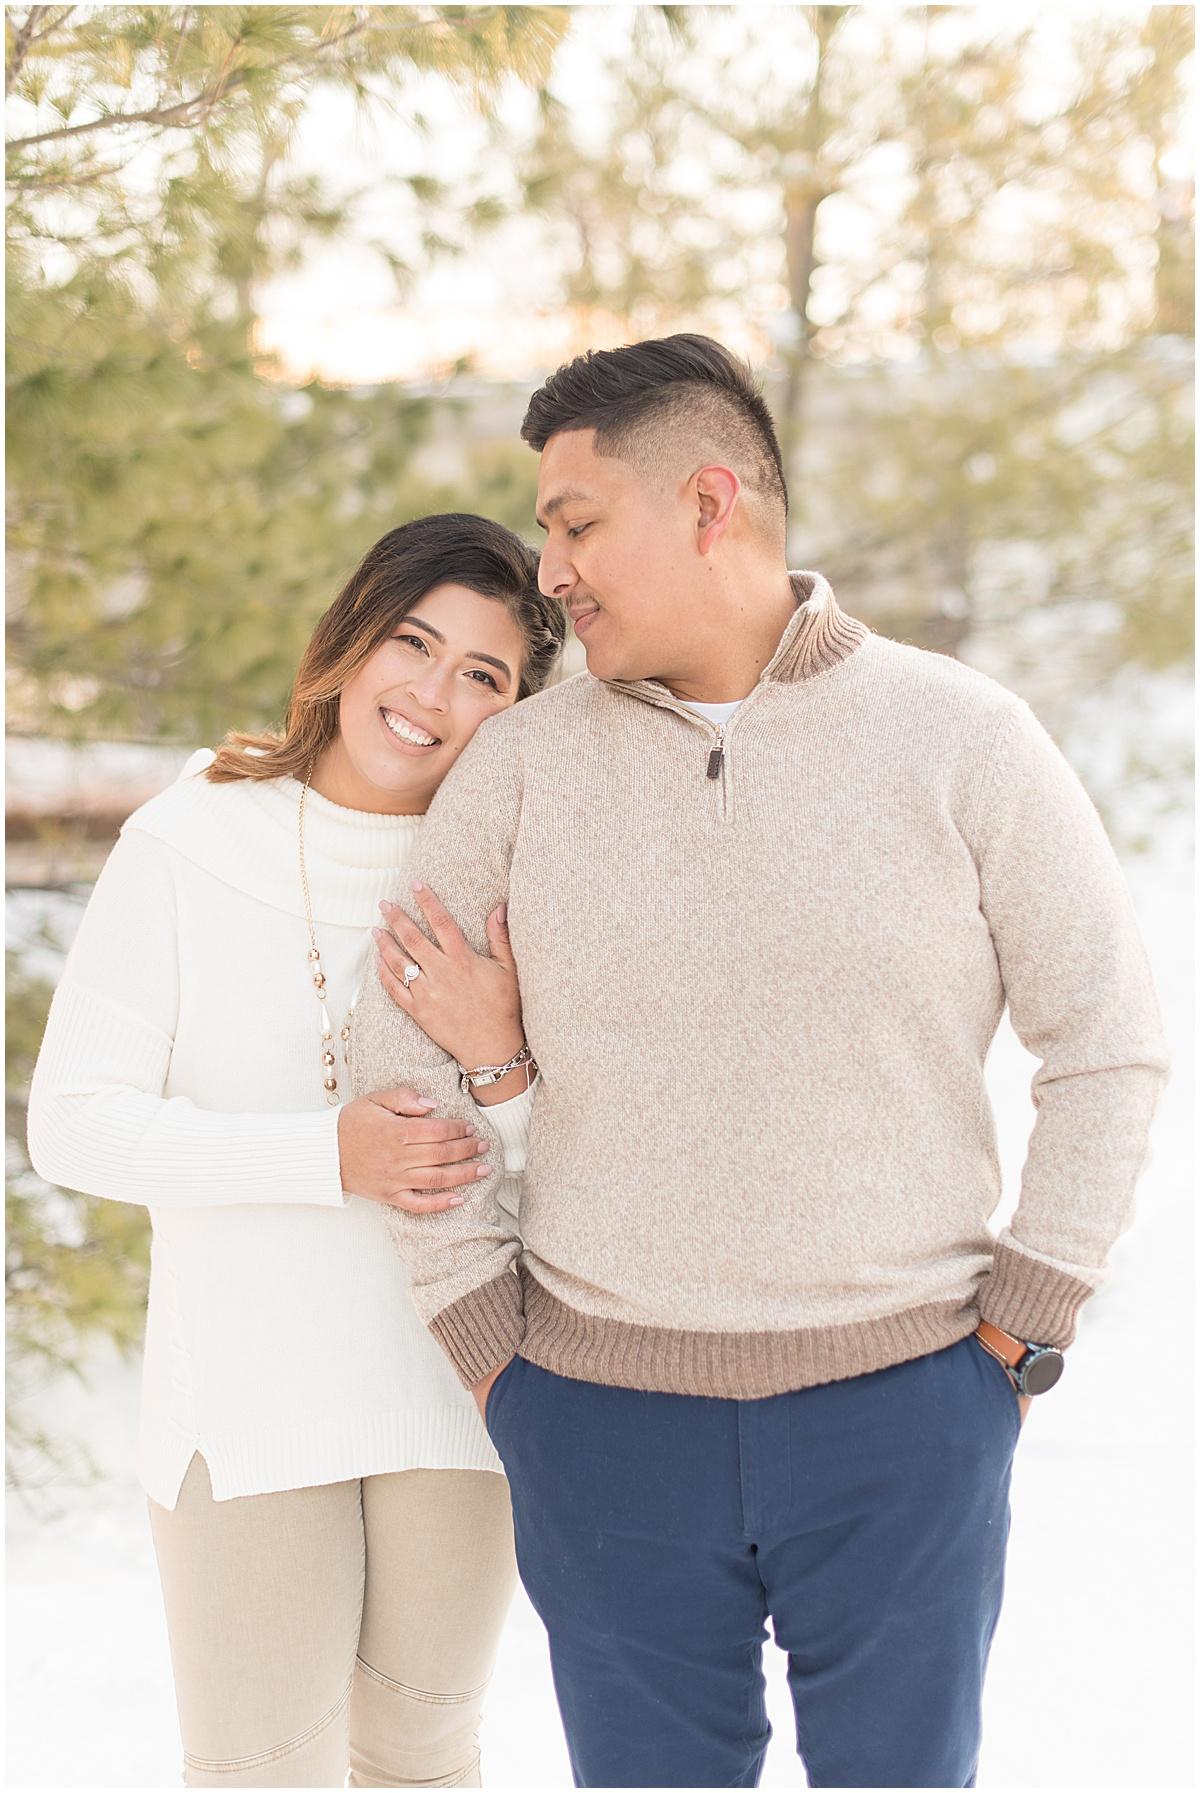 Jose & Carolina - Engagement Photos in Downtown Lafayette Indiana12.jpg